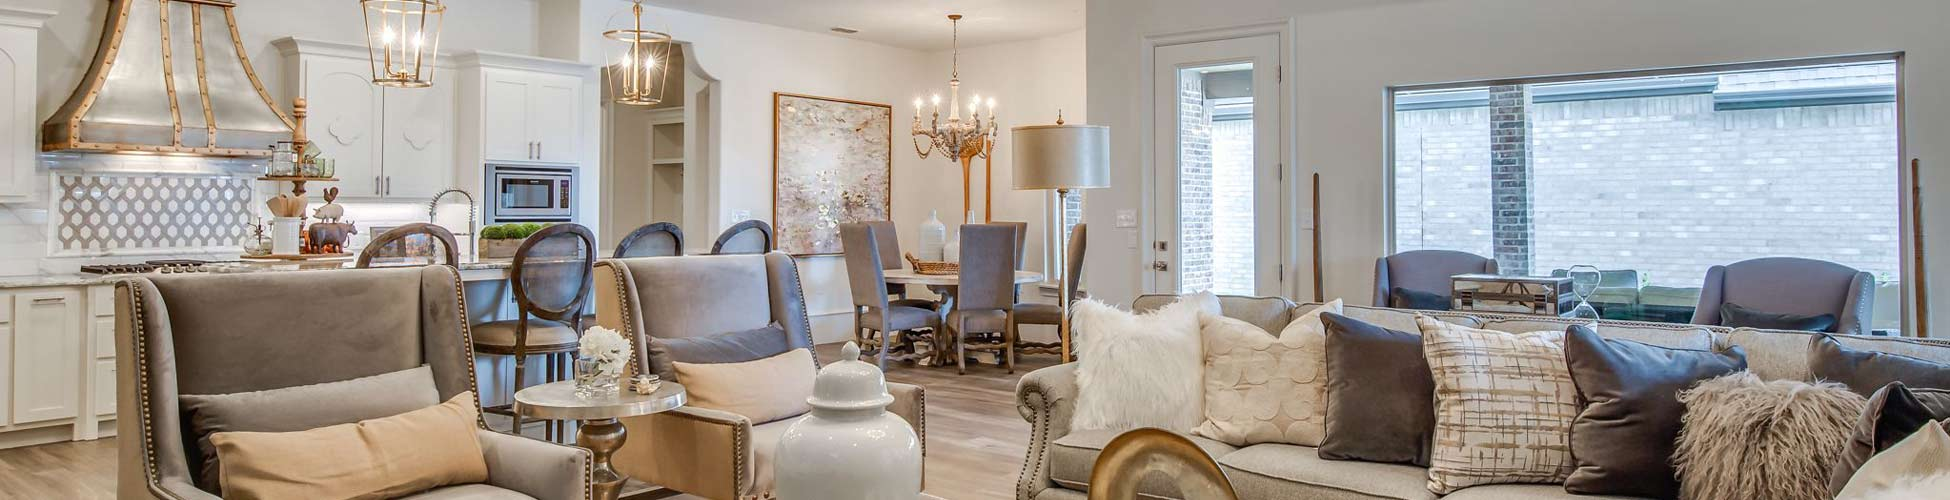 beautiful-light-living-room.jpg